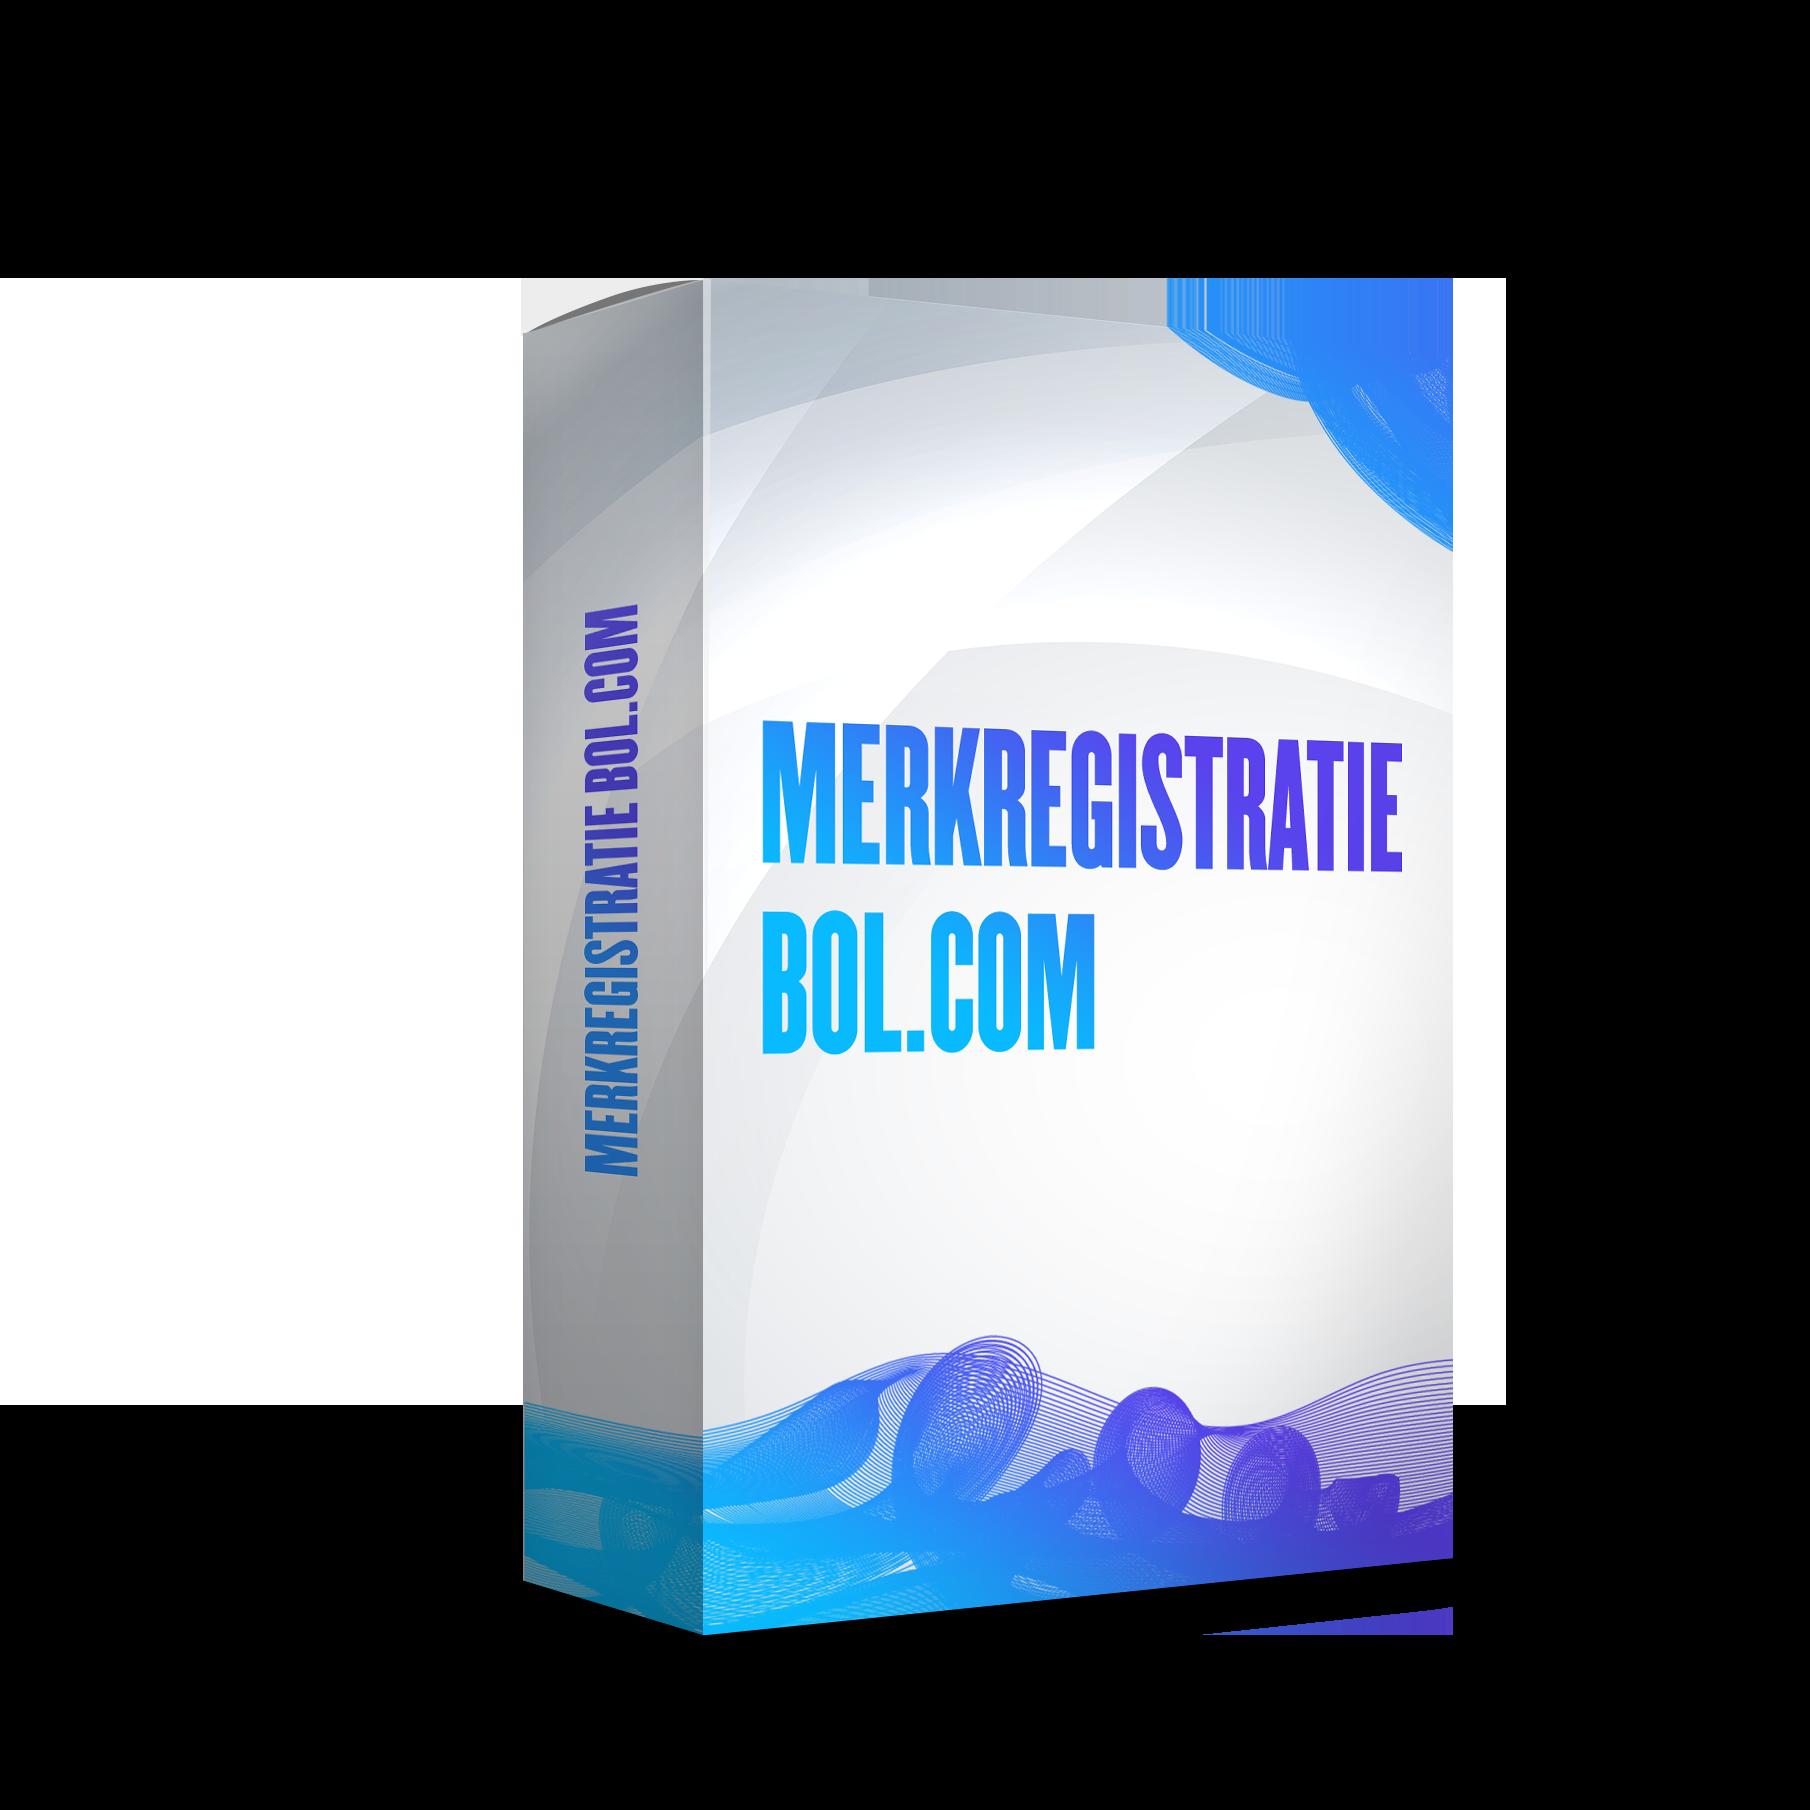 Merkregistratie bol.com